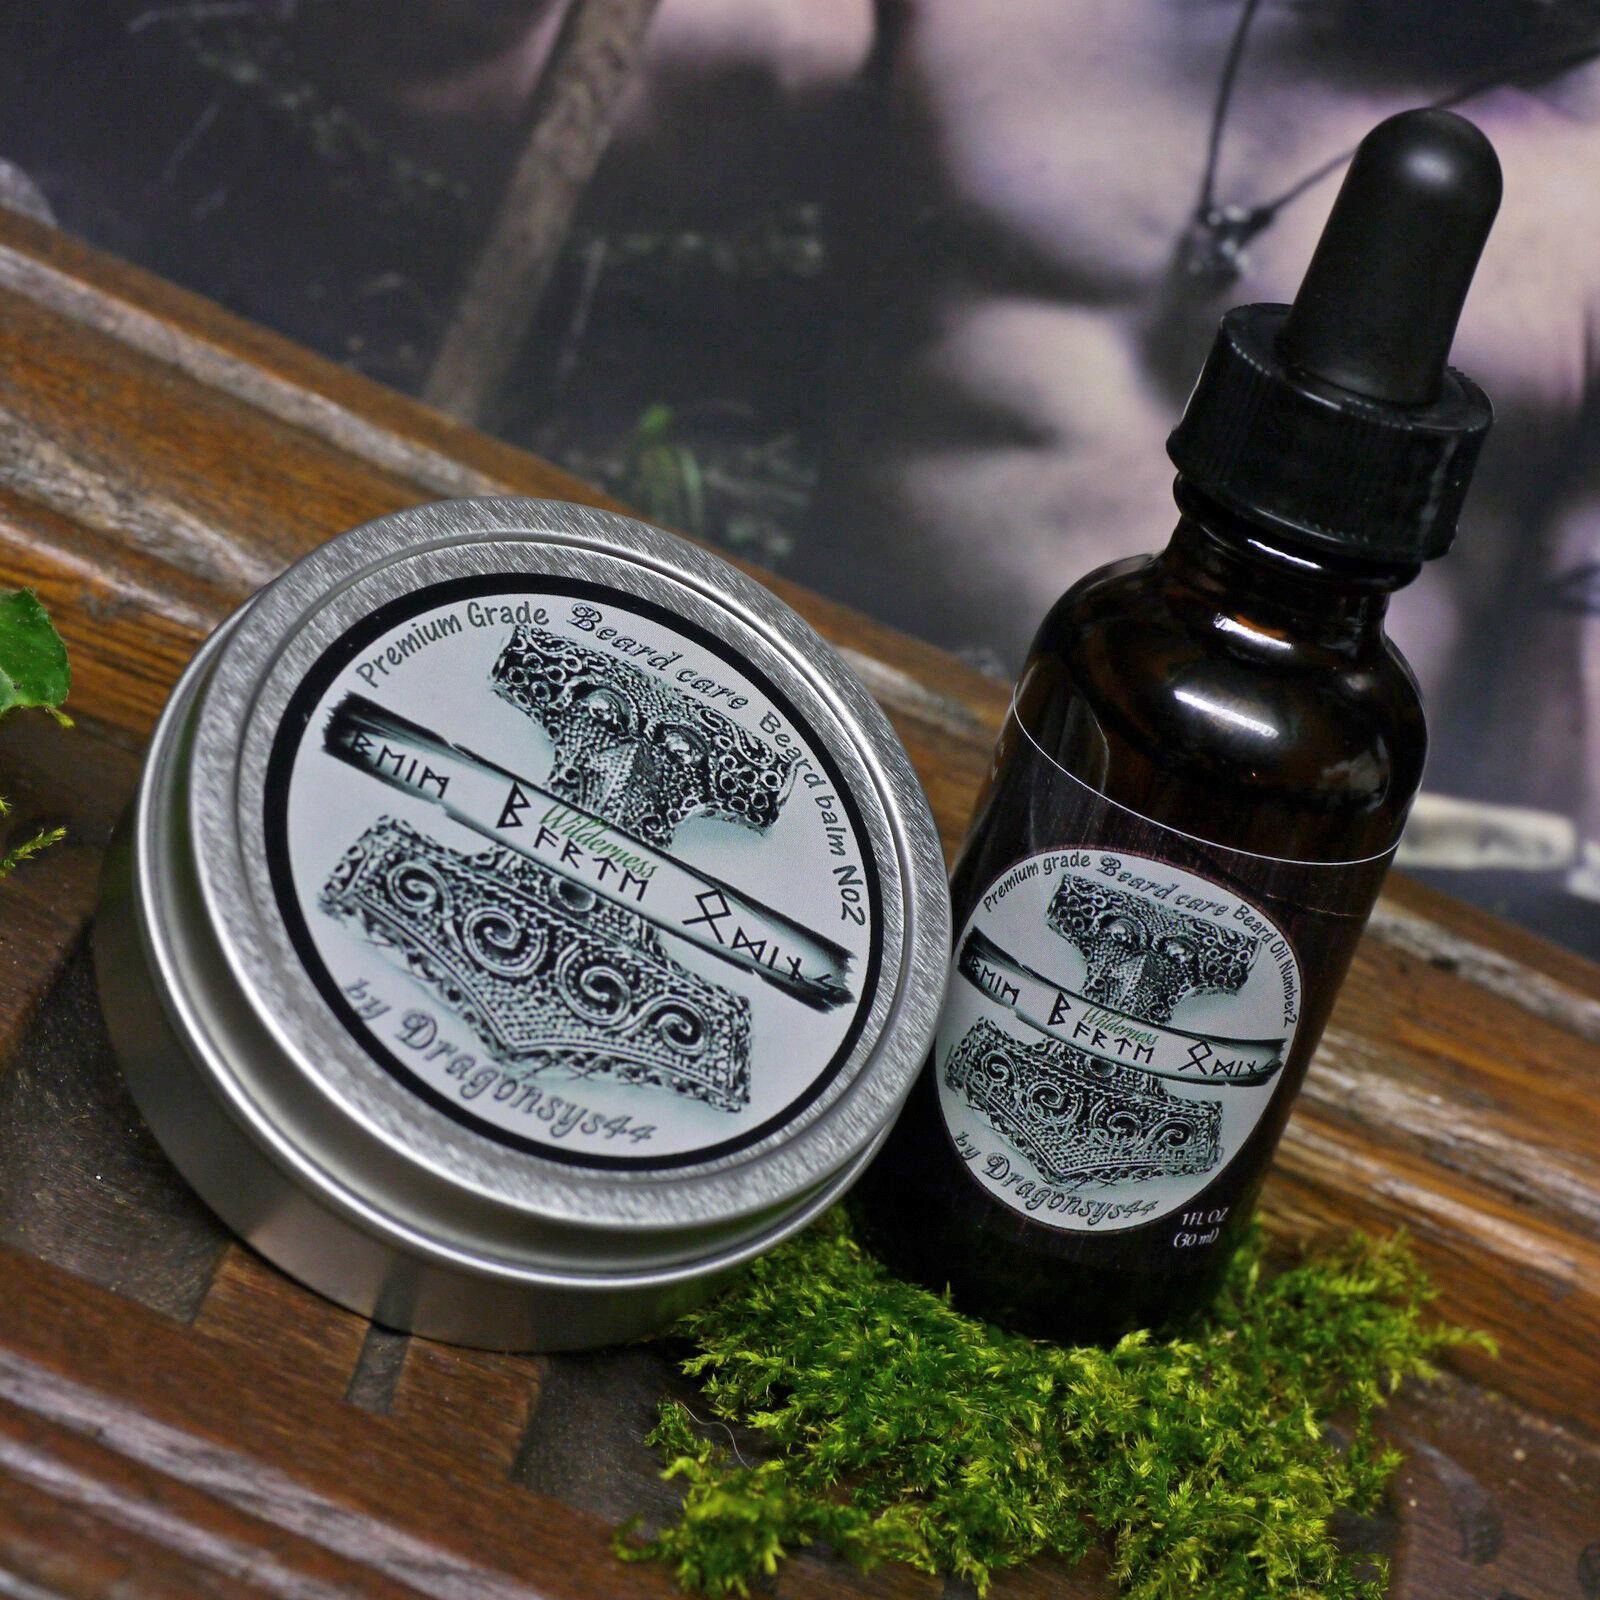 NEU Beim Barte ODINS Bartbalsam 59ml Bartpflege-SET 30ml Bartöl Wilderness yucon